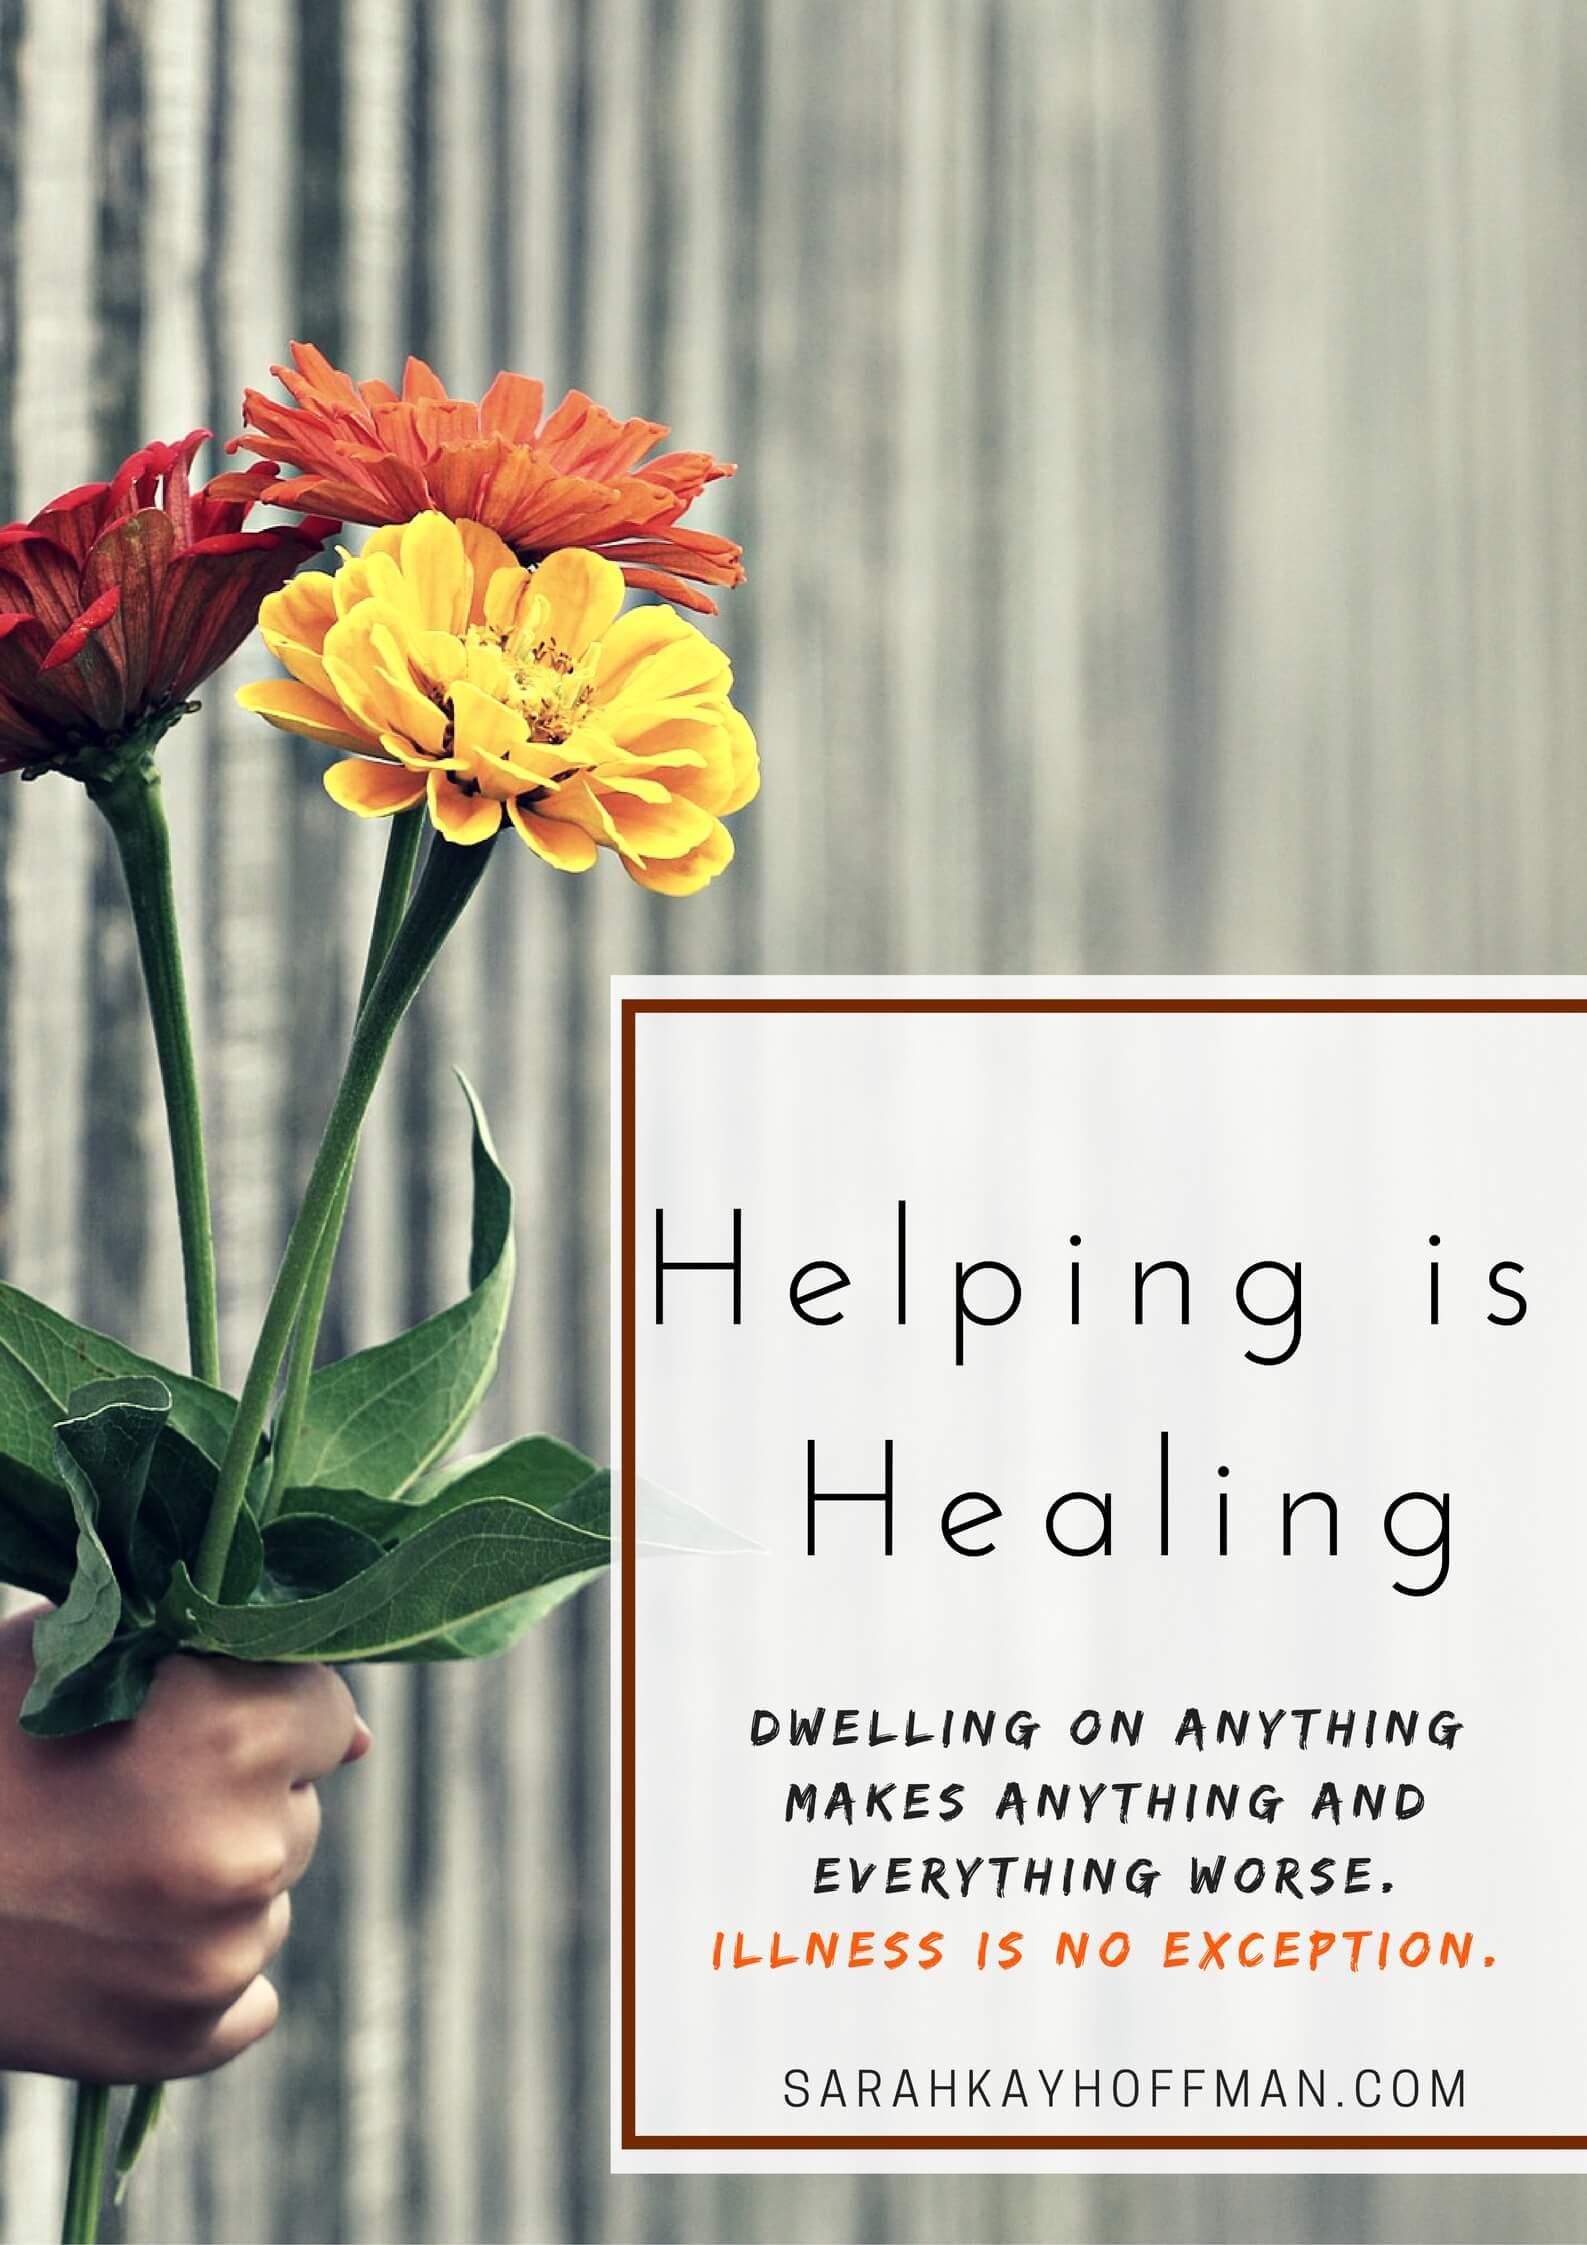 Helping is Healing sarahkayhoffman.com